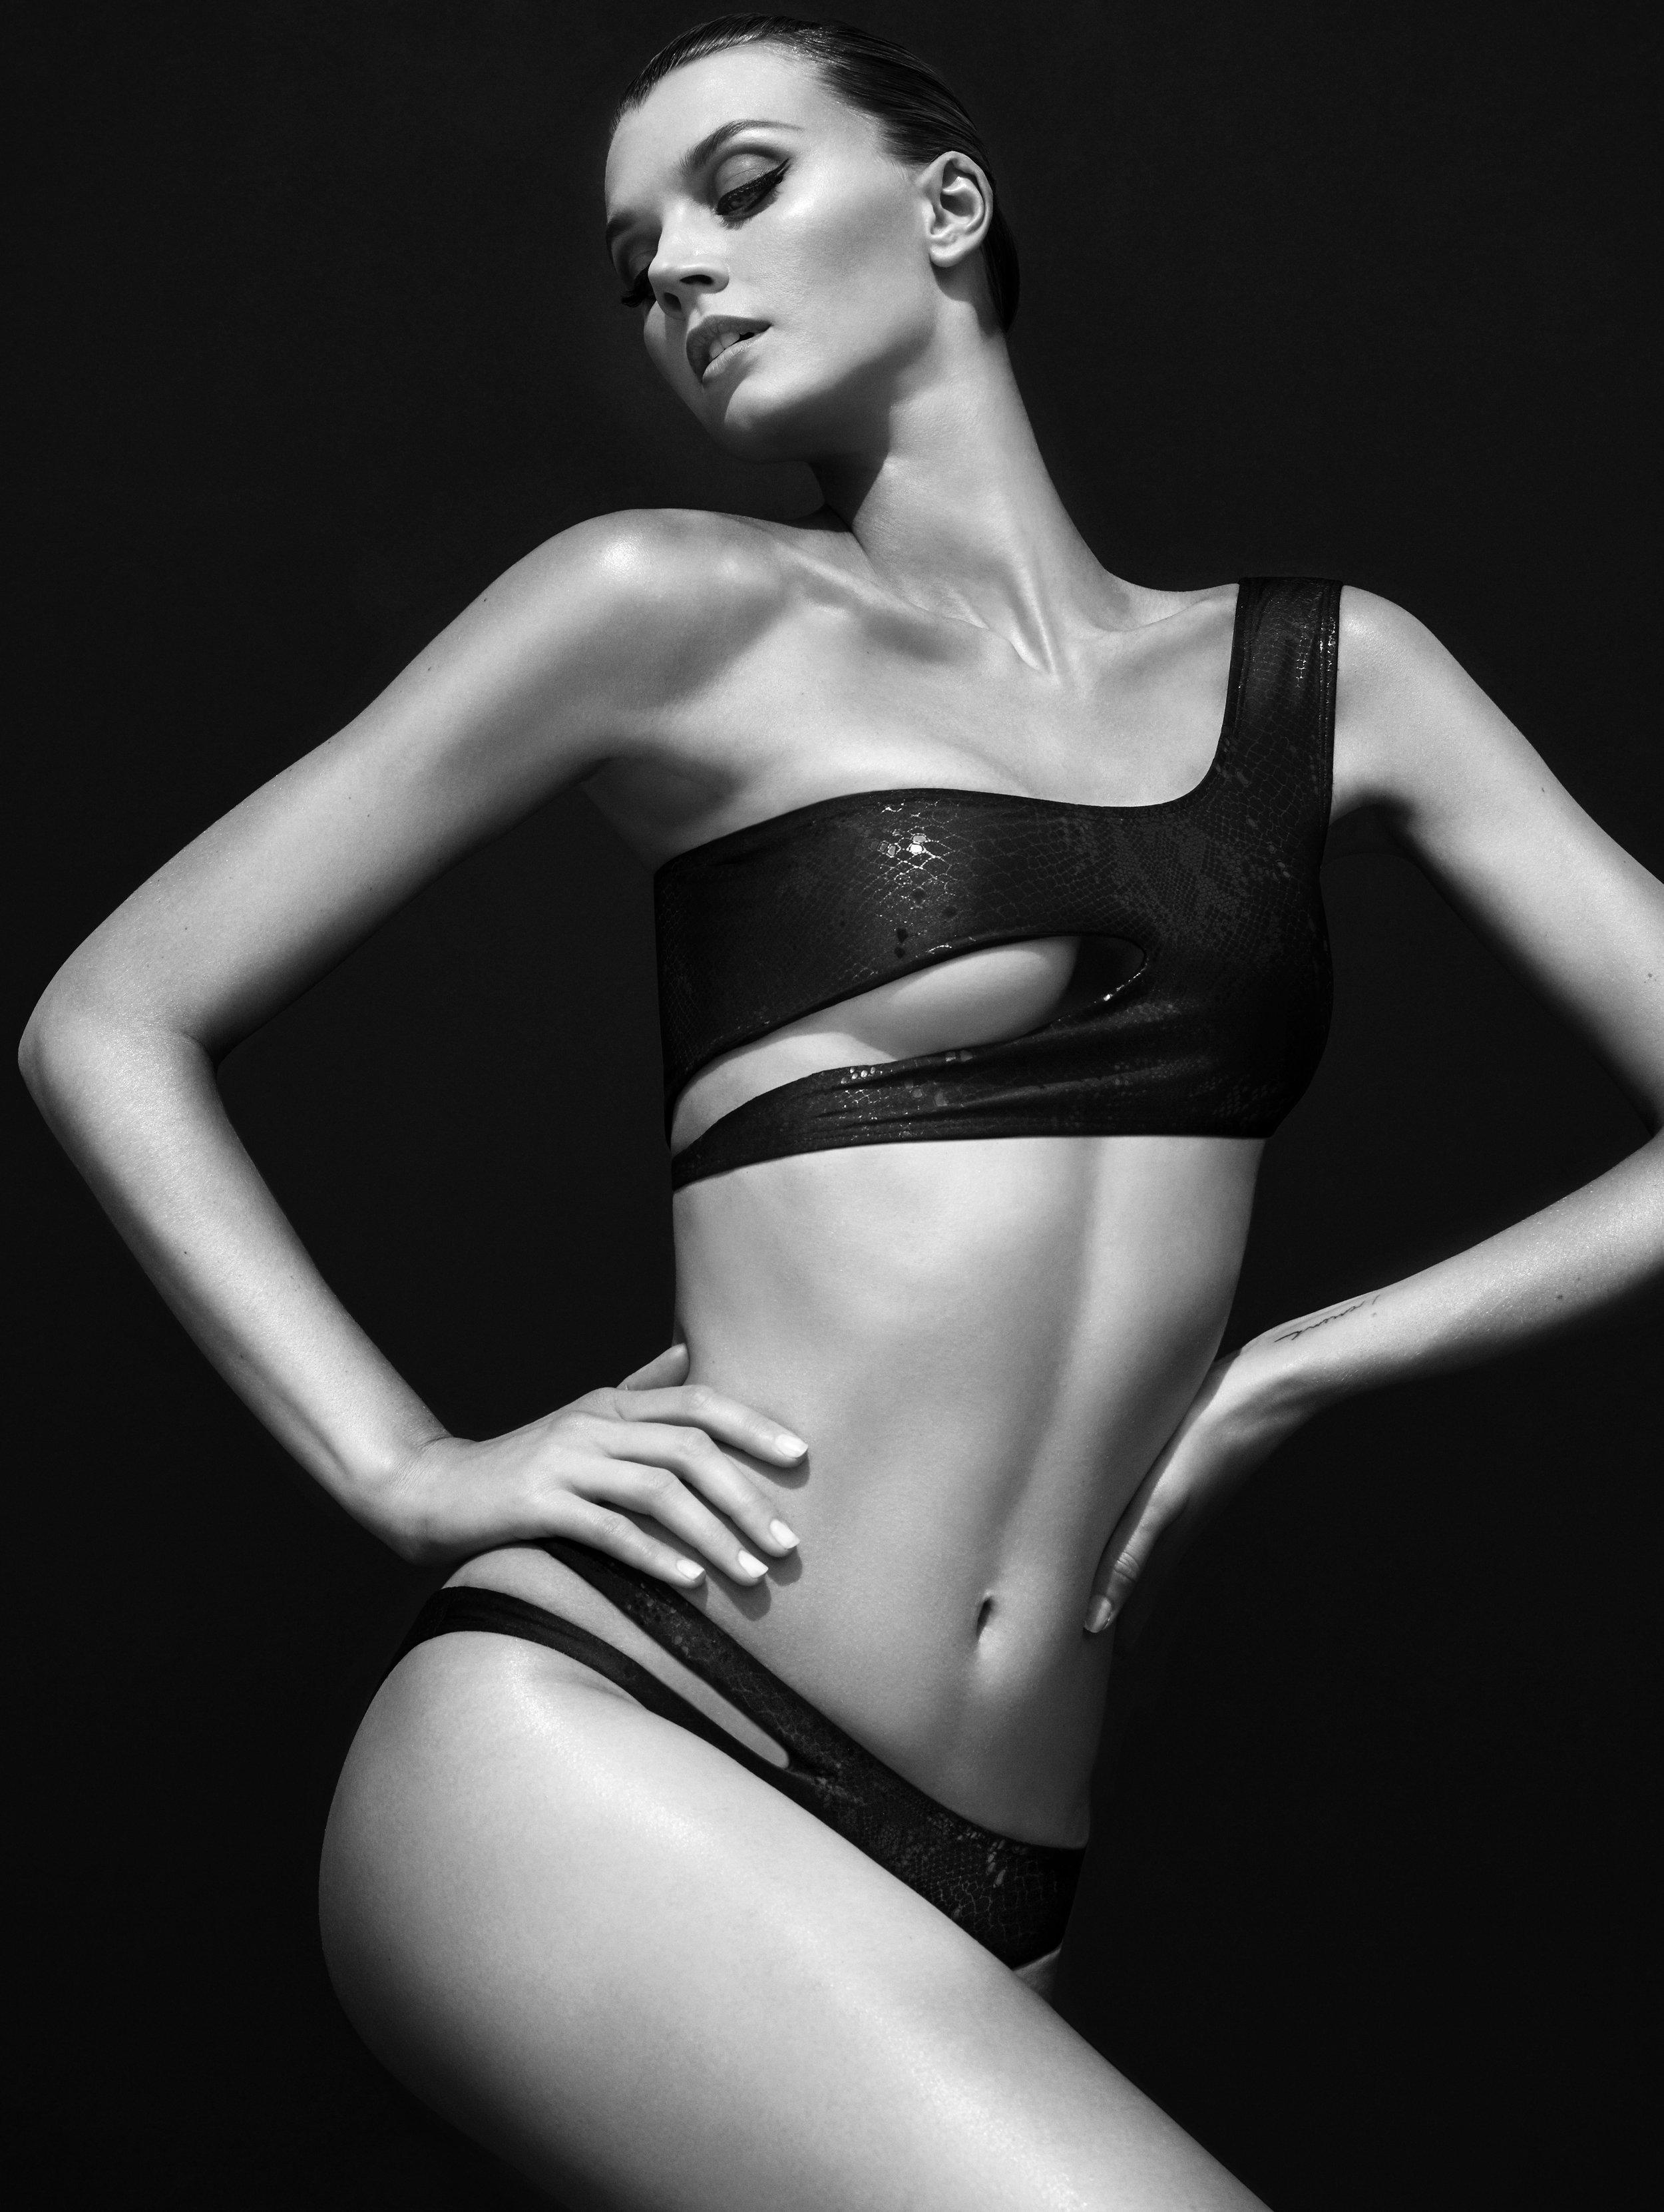 Jayne Moore English model for Style Caster Magazine swimwear new york city rooftop shoot Bruce Soyez-Bernard